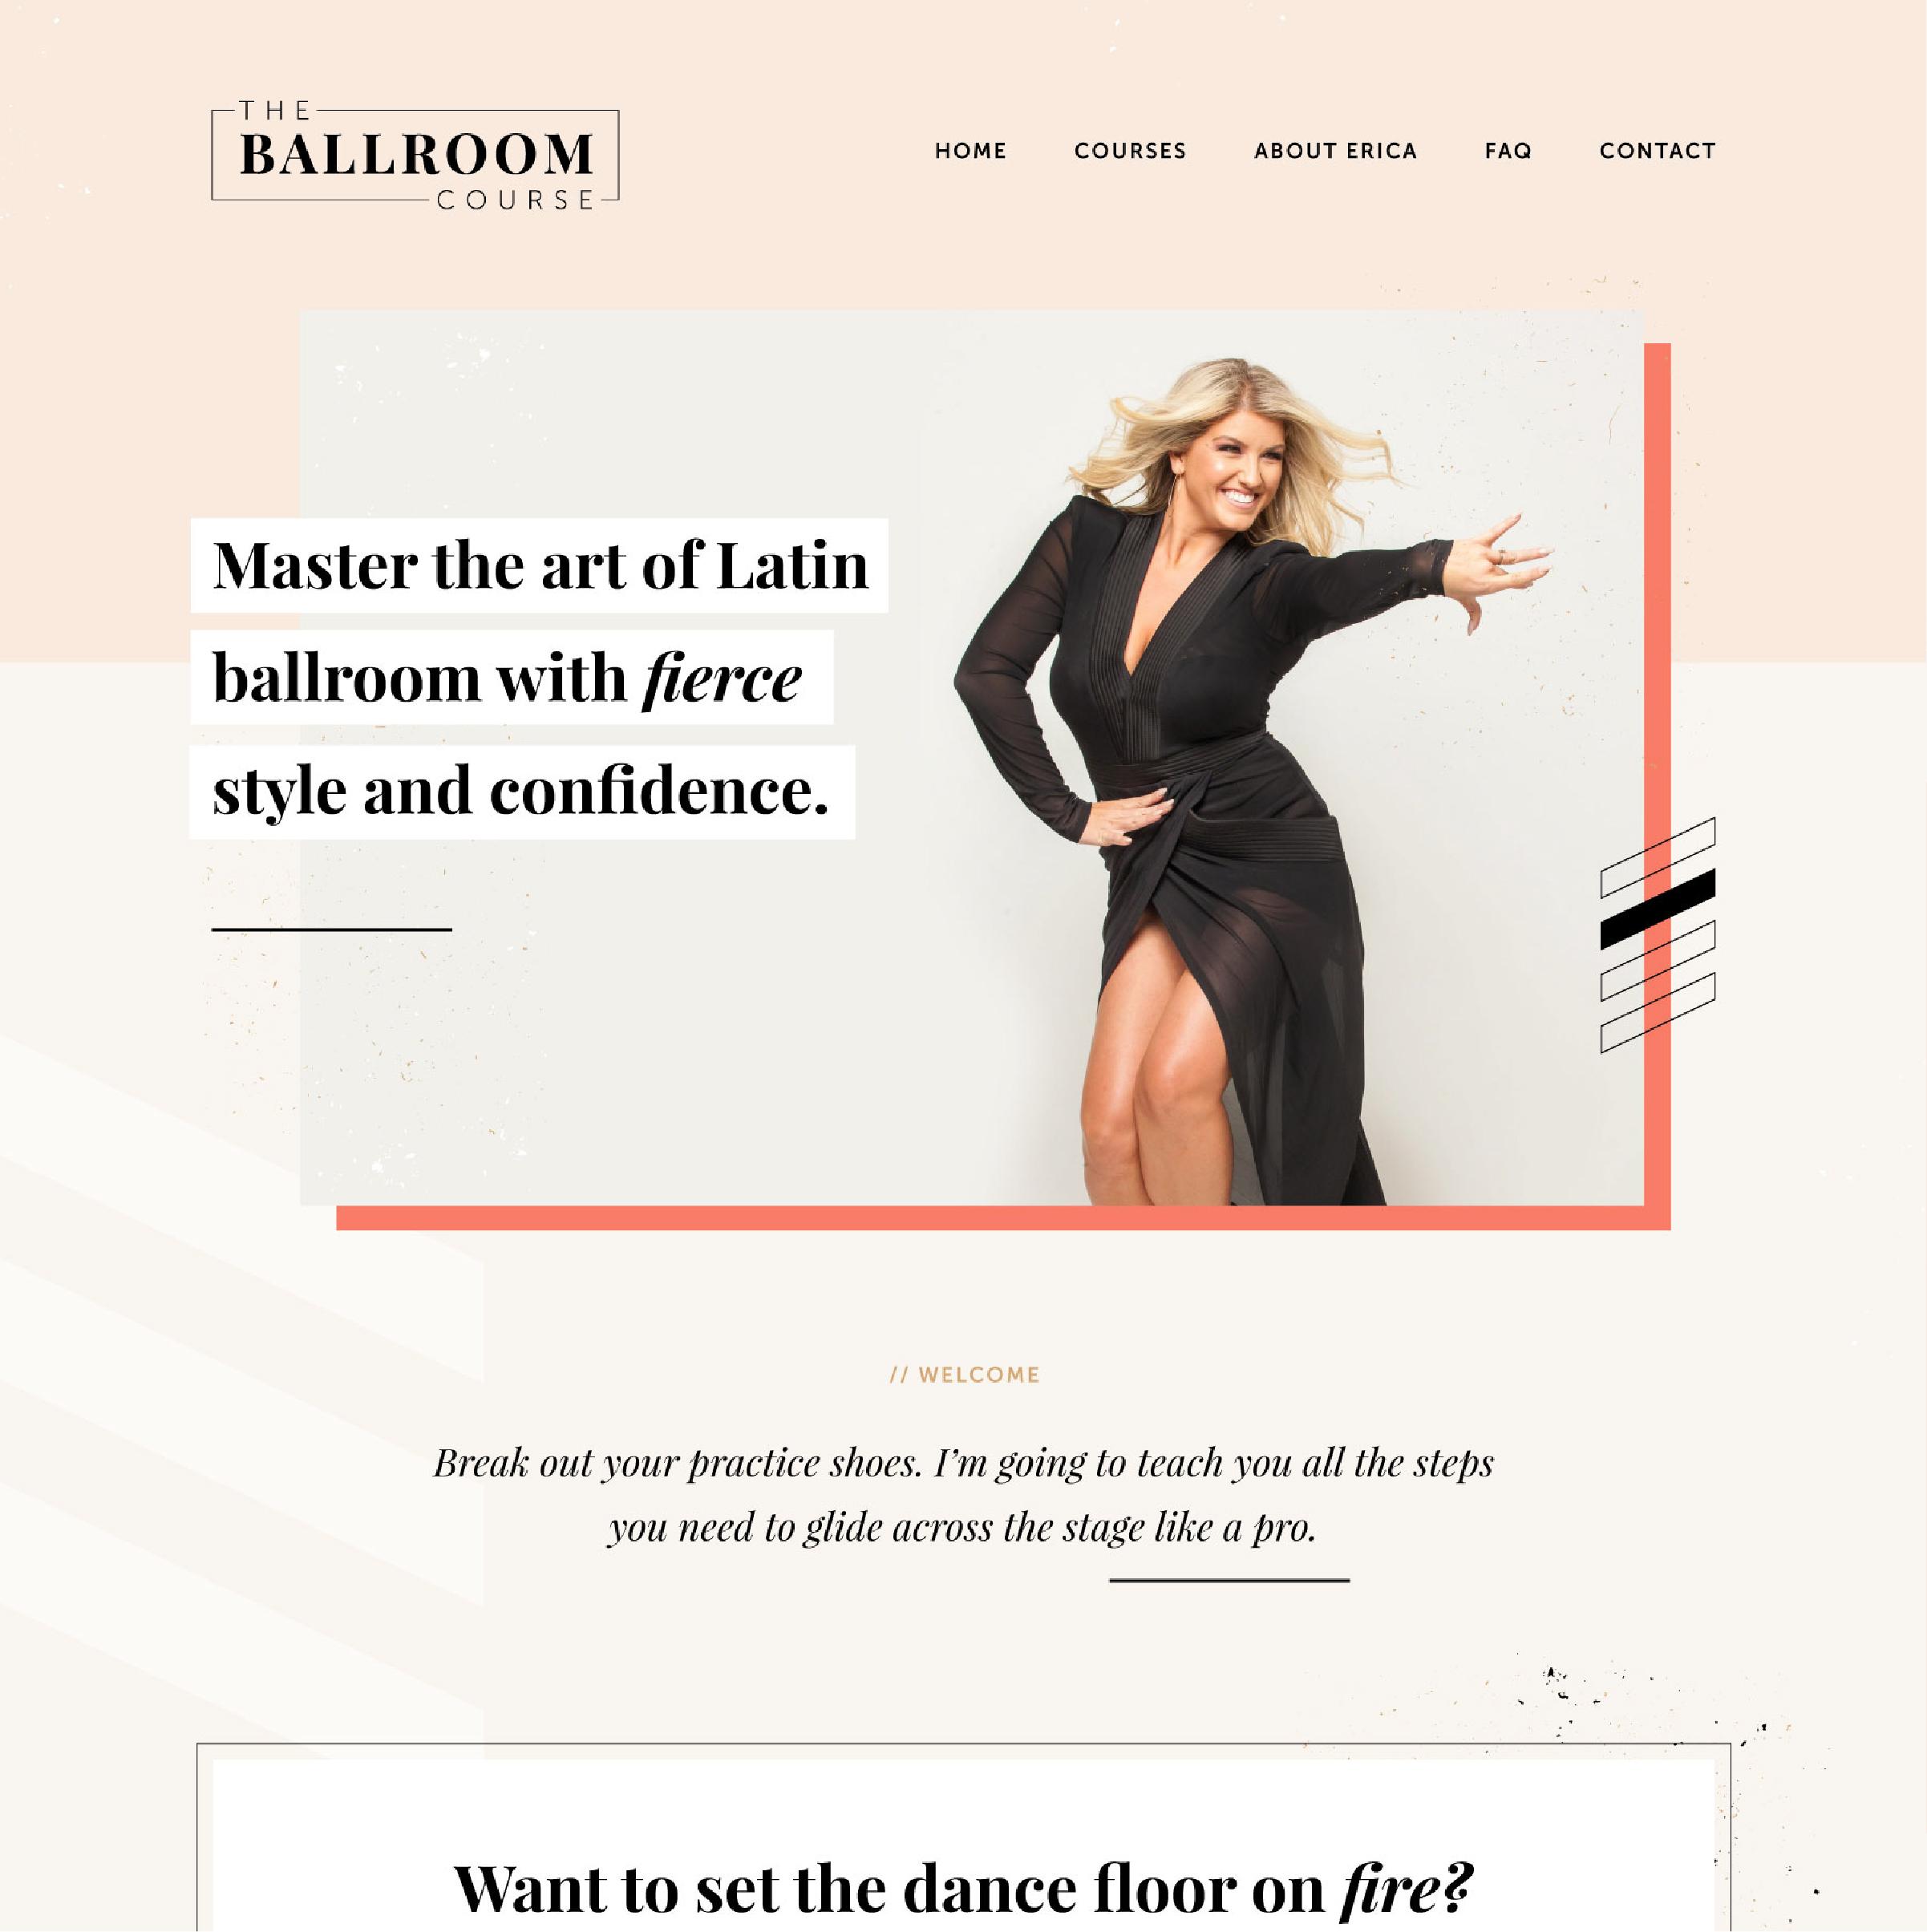 TheBallroomCourse_IG_Swipes_4.jpg